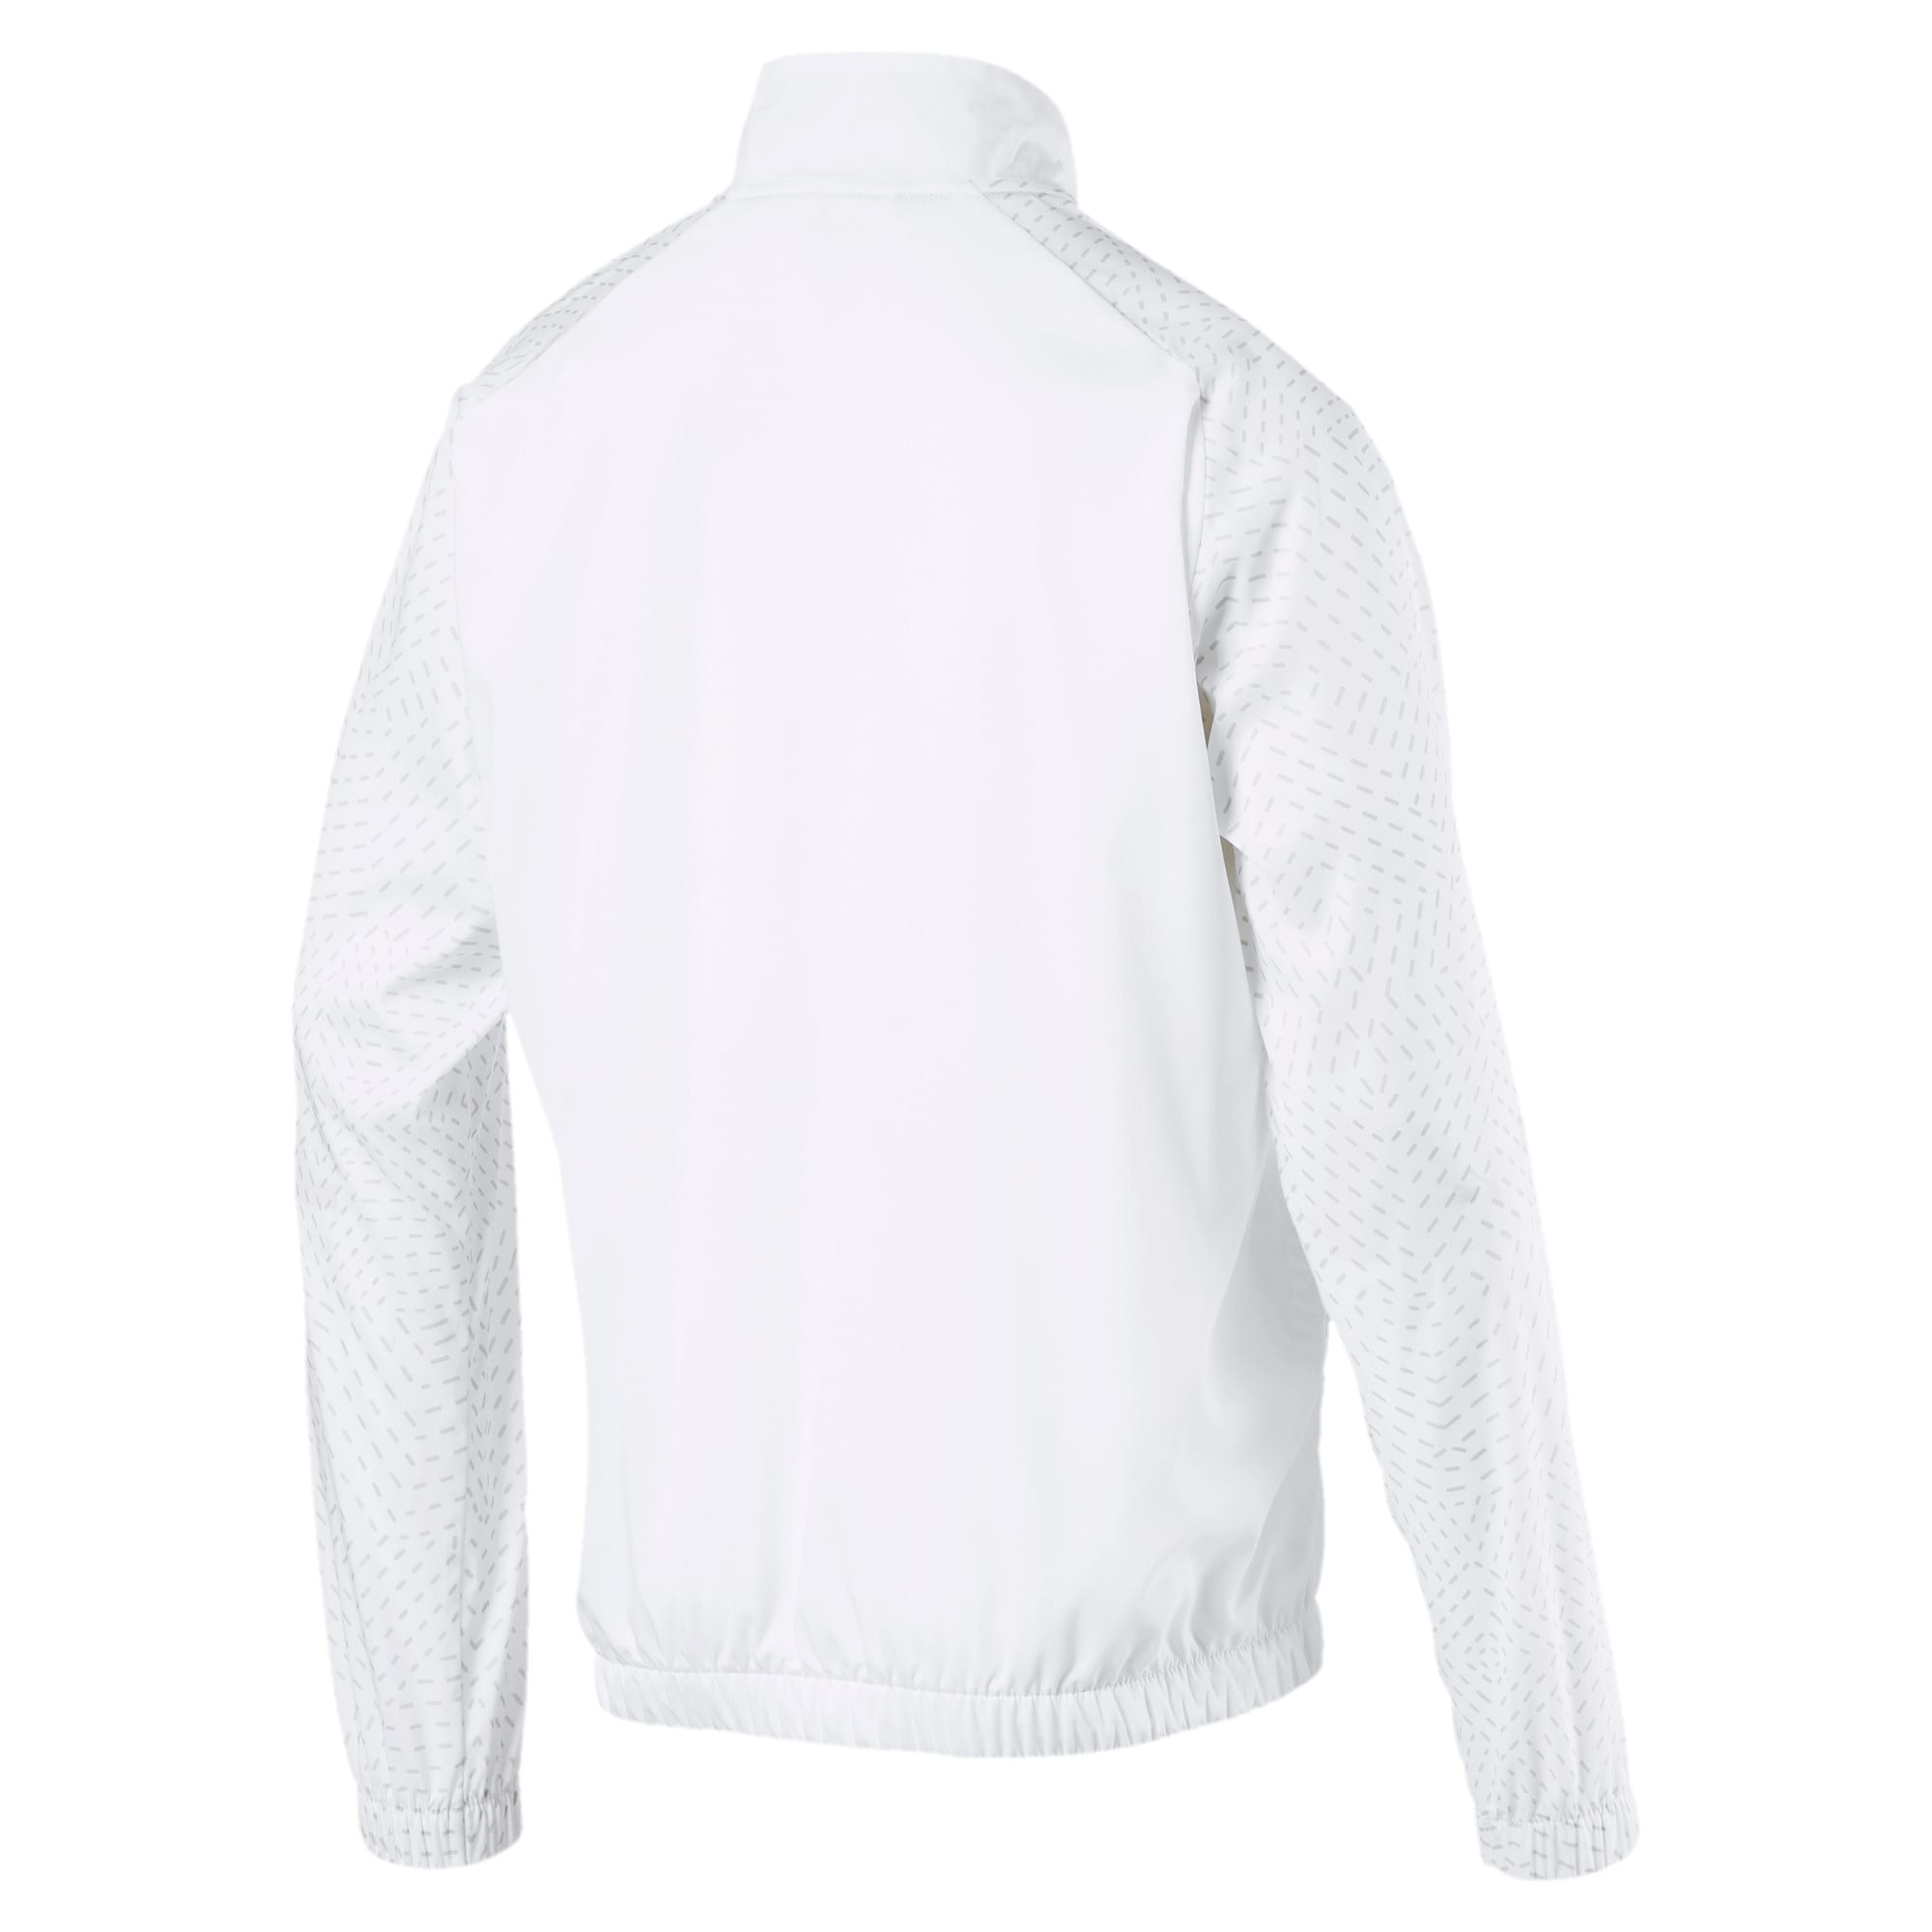 Thumbnail 2 of Energy Woven Men's Sweat Jacket, Puma White, medium